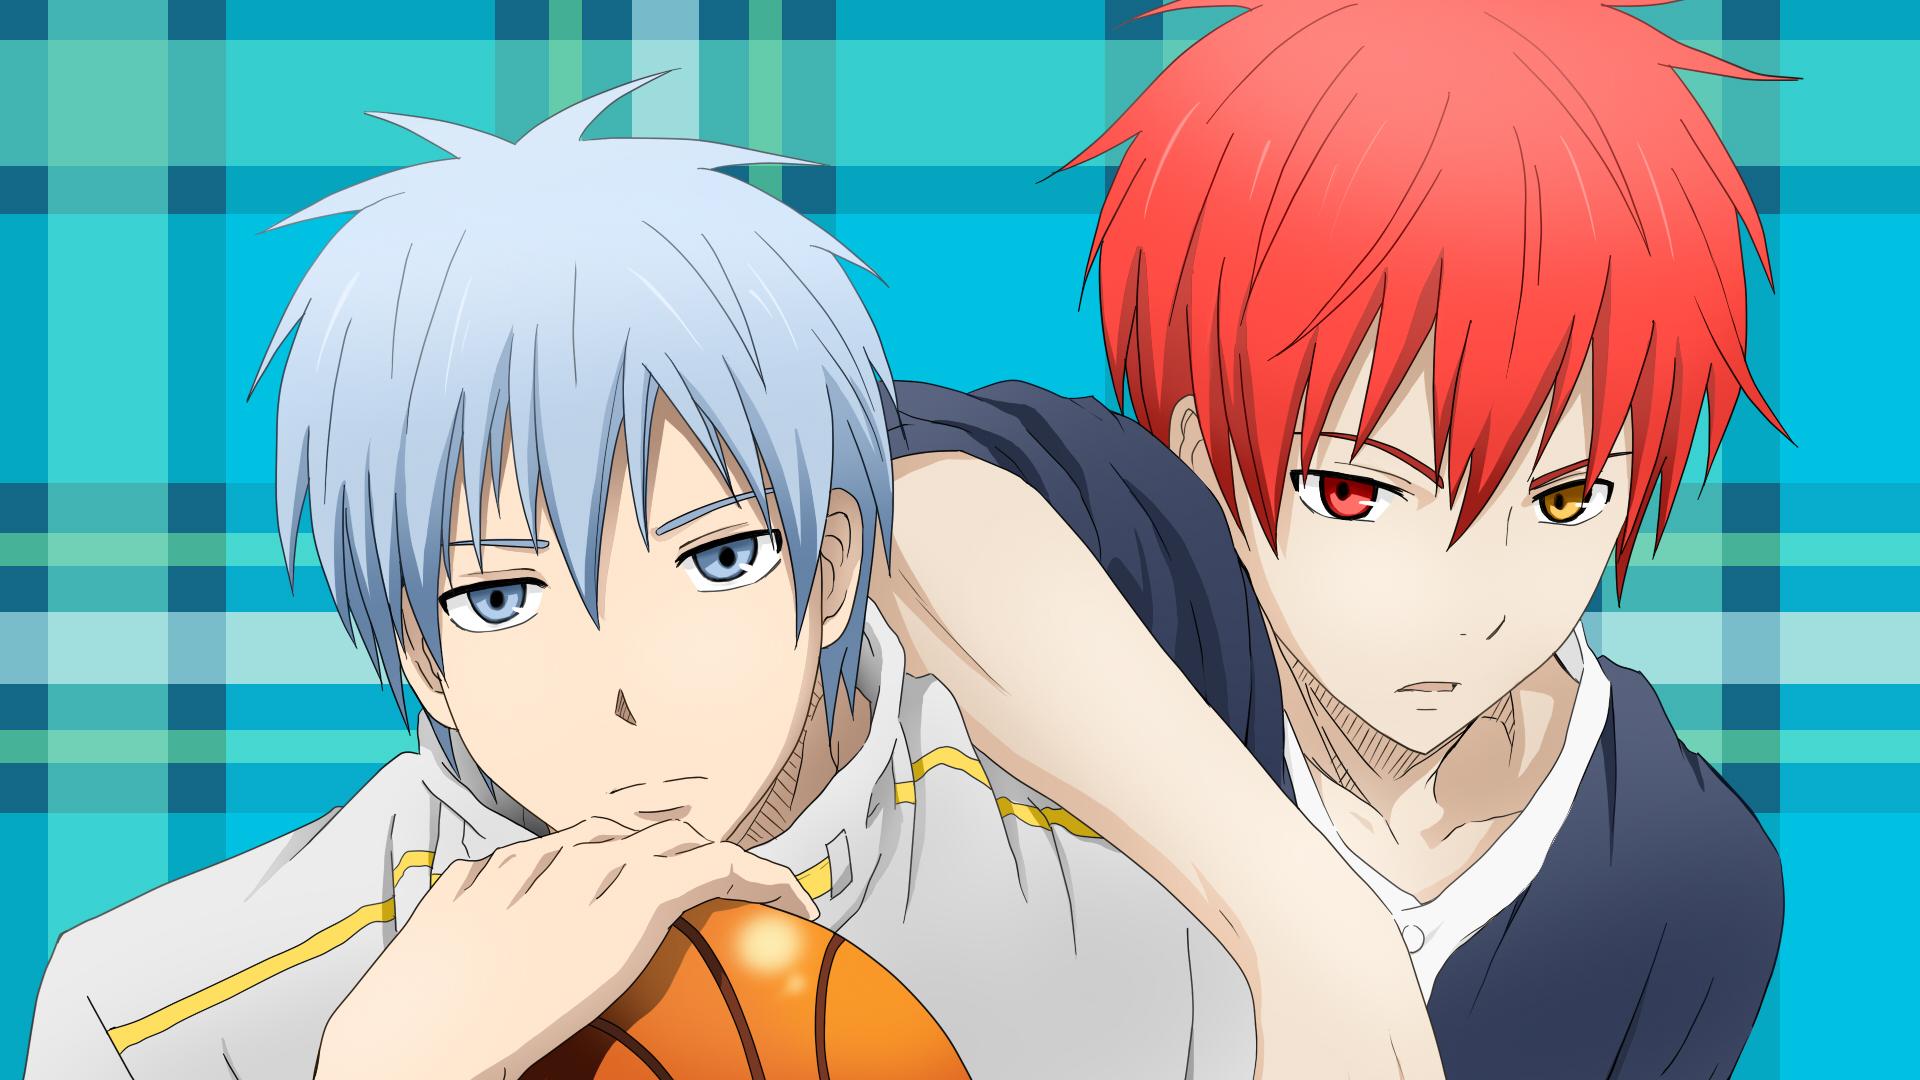 Kuroko no basuke kurokos basketball hd wallpaper 1145614 view fullsize kuroko no basuke image voltagebd Images